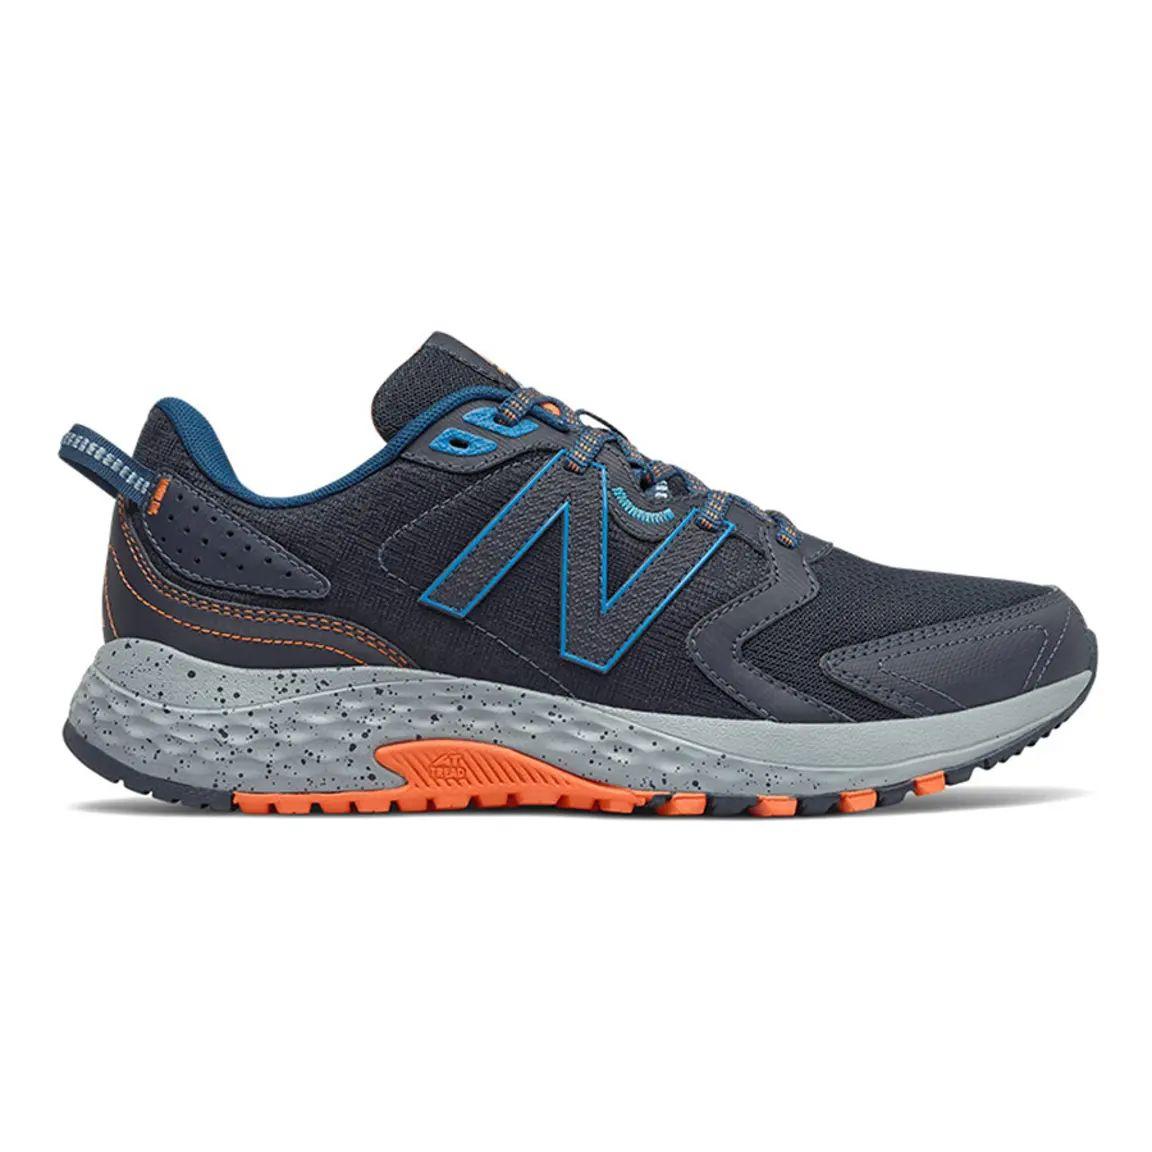 Zapatillas New Balance 410 v7 negro azul marino rojo